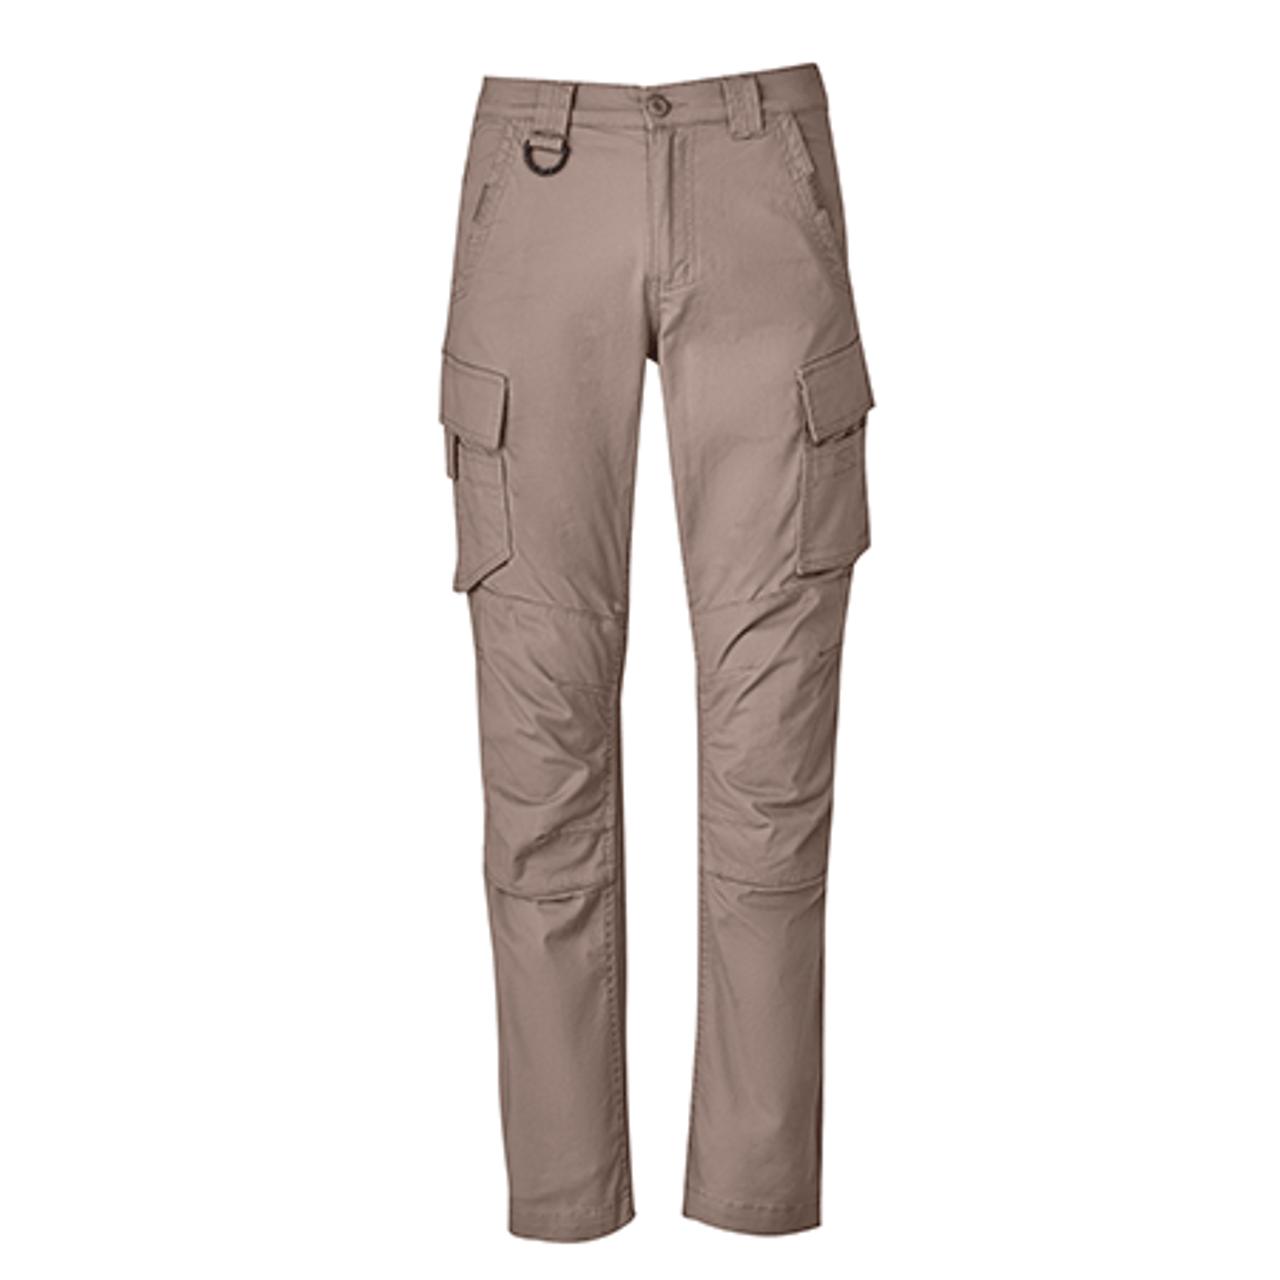 Work Pants Shorts